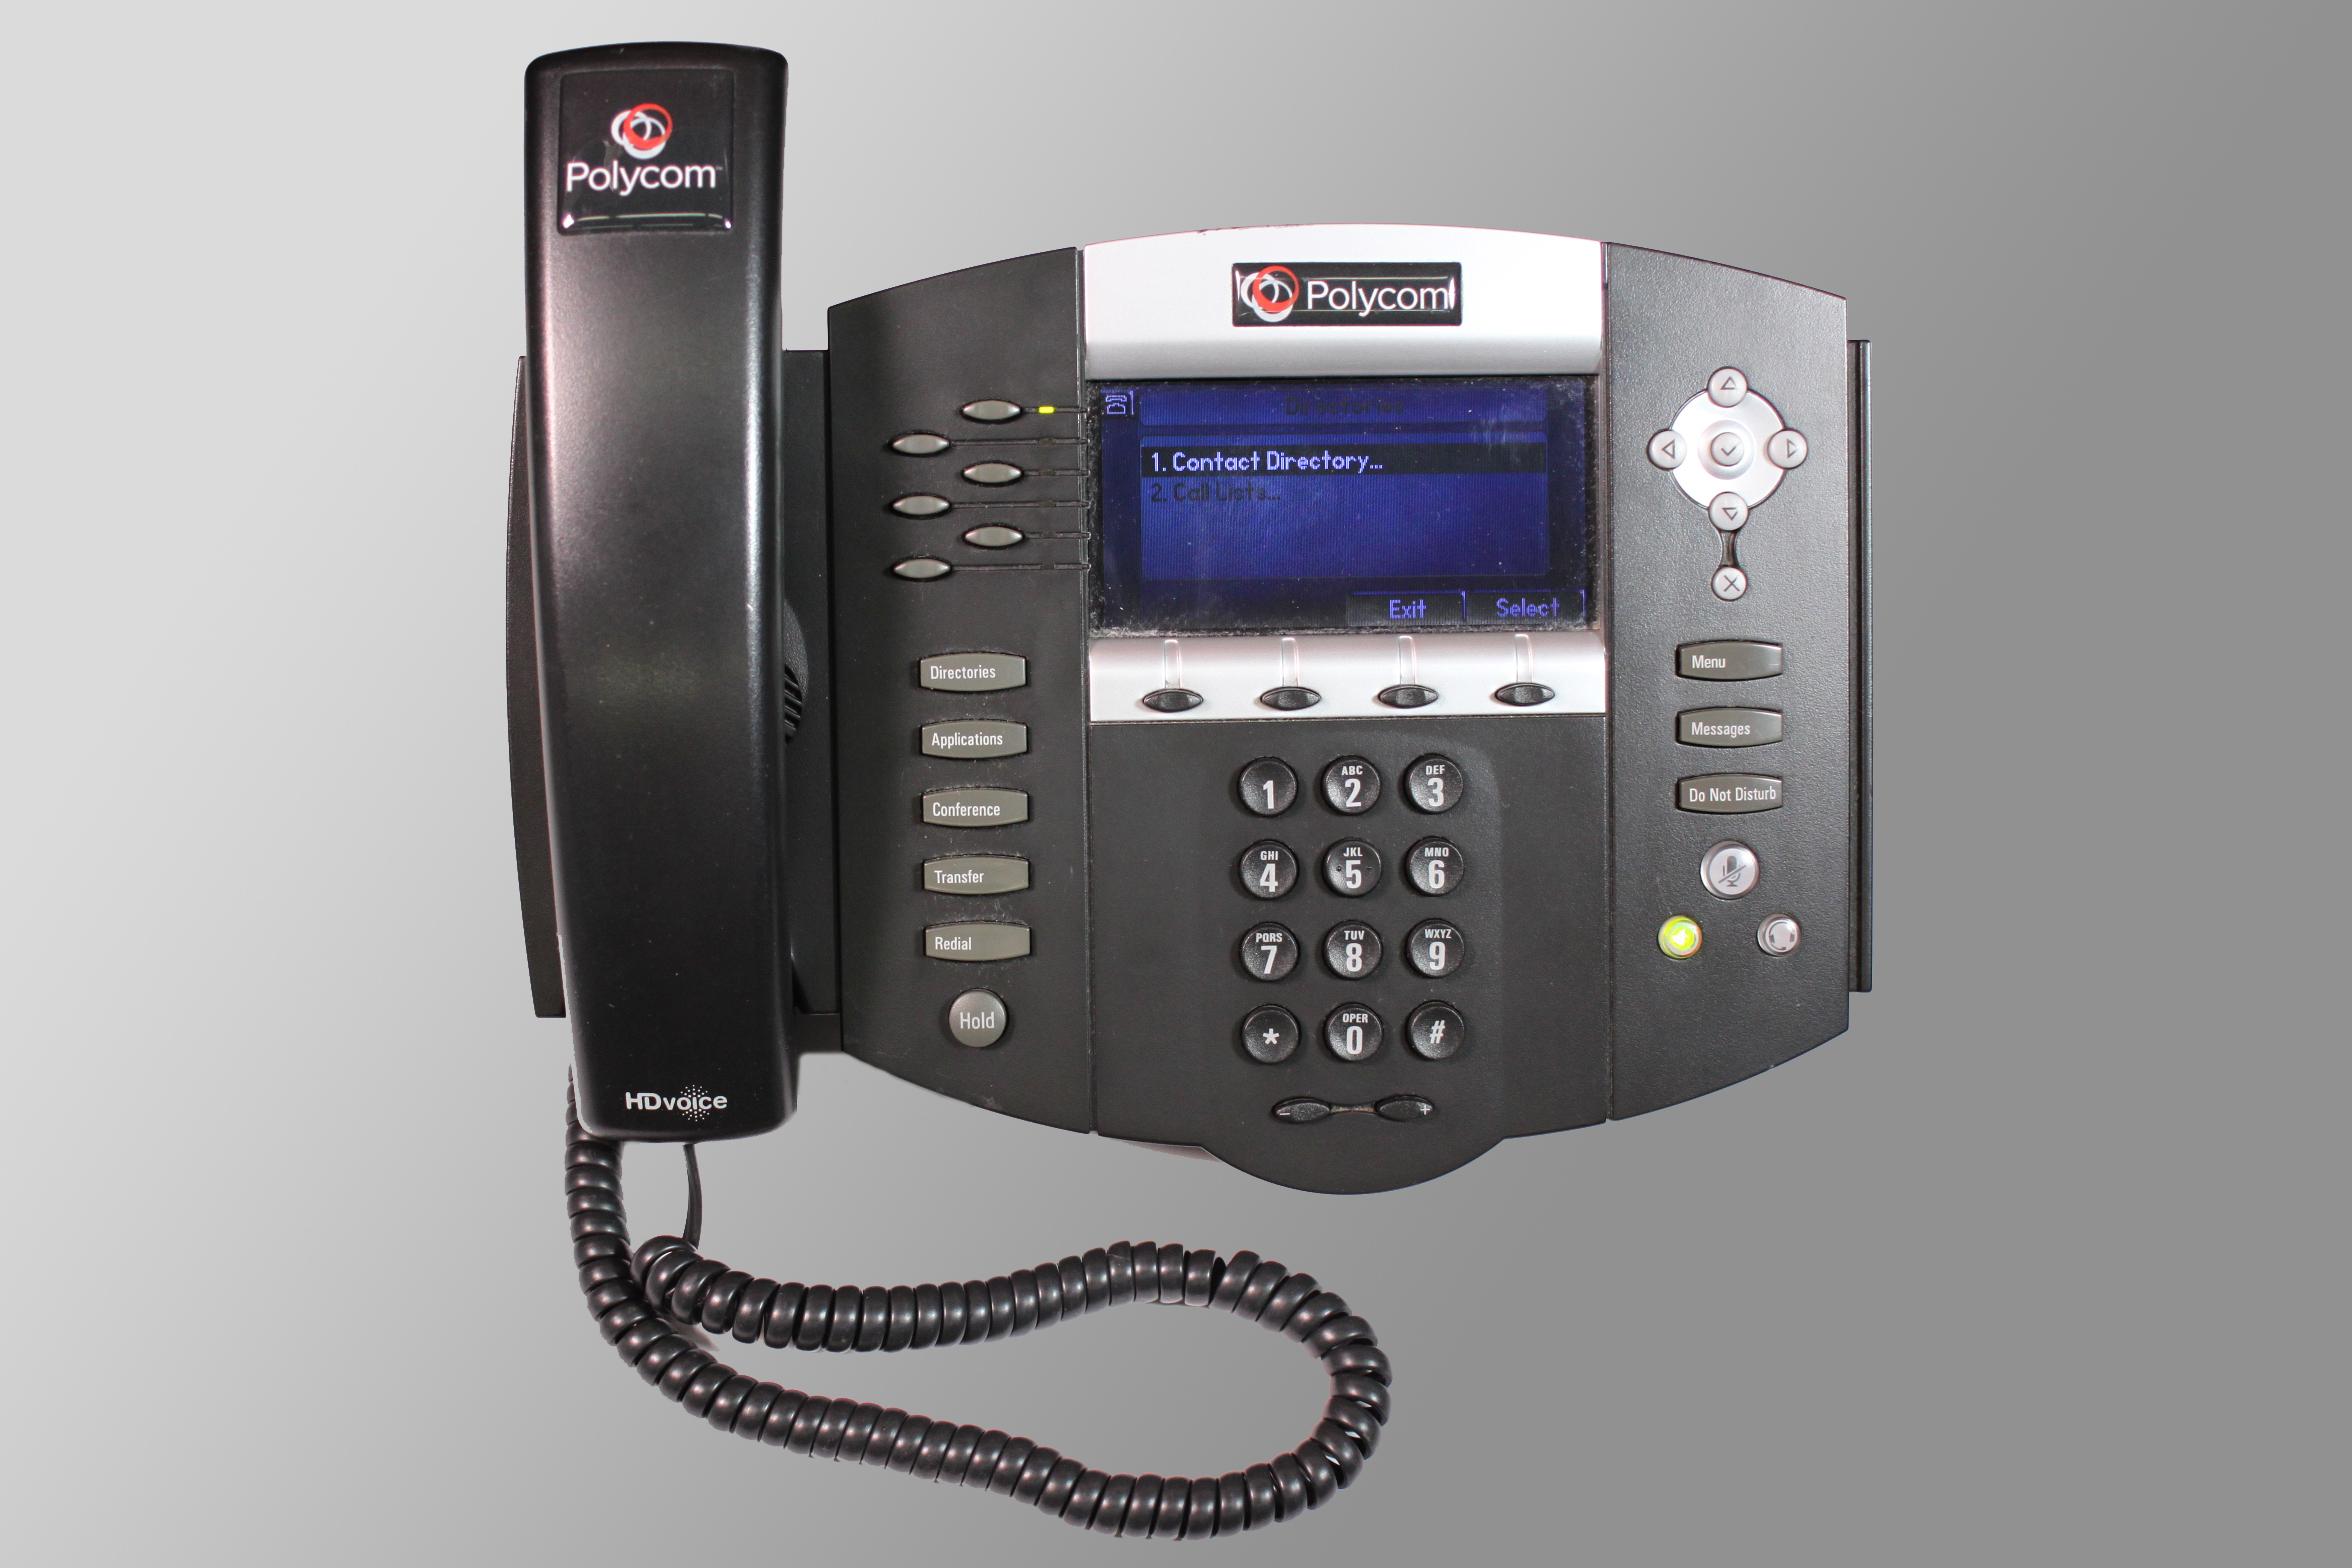 uniden cordless phone plus 1 handset 1735 1 manual